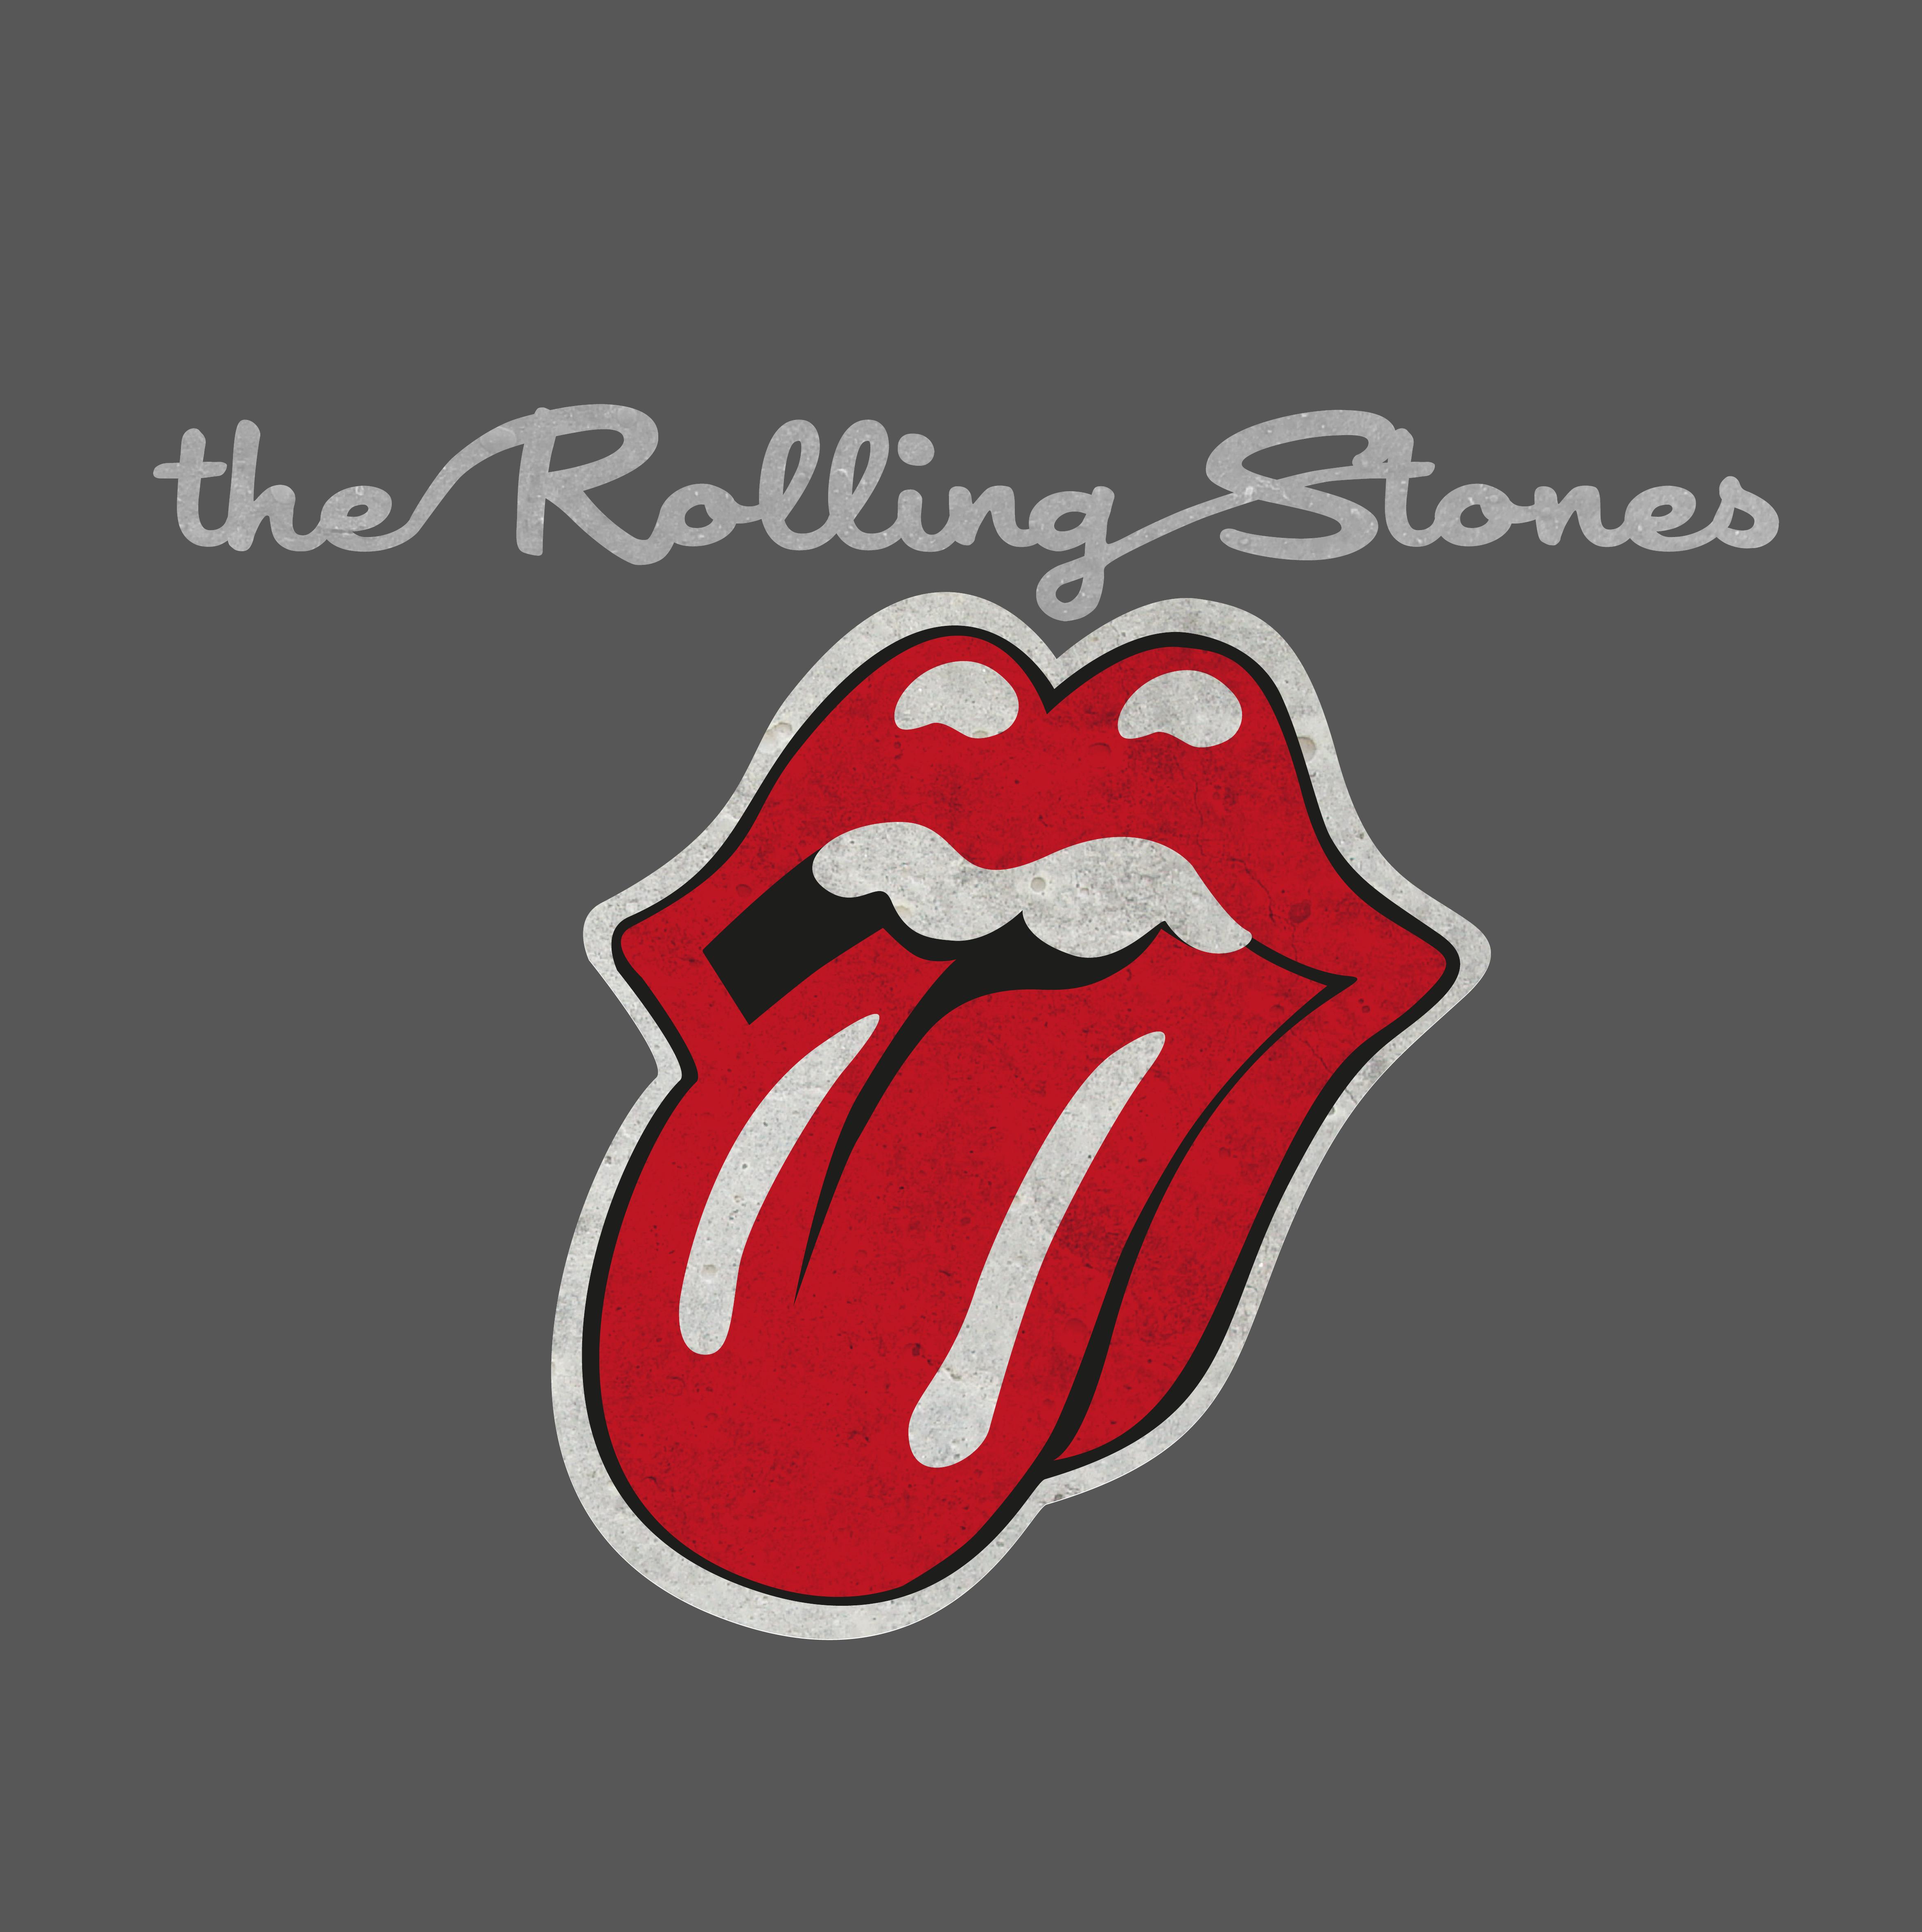 Wallpapers sobre Rolling Stones HD 15 Megapixeles blog gente 4695x4720